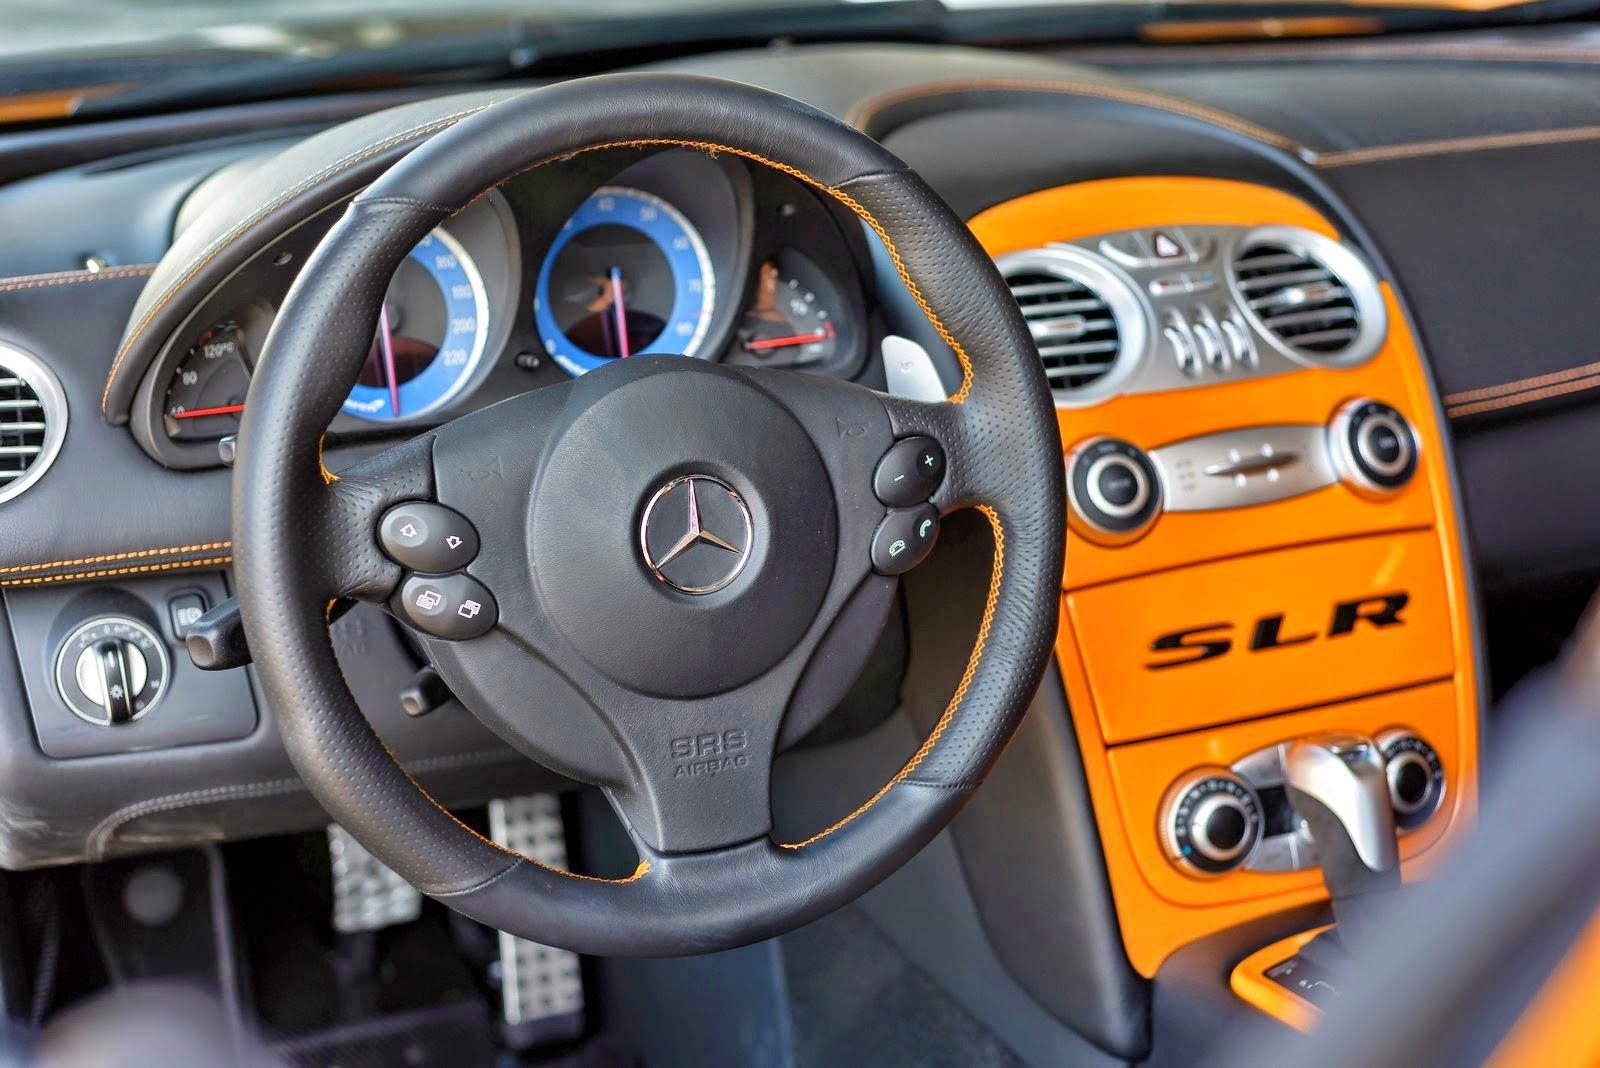 Mercedes Benz Sl >> Mercedes-Benz SLR McLaren 722S Roadster Edition | BENZTUNING